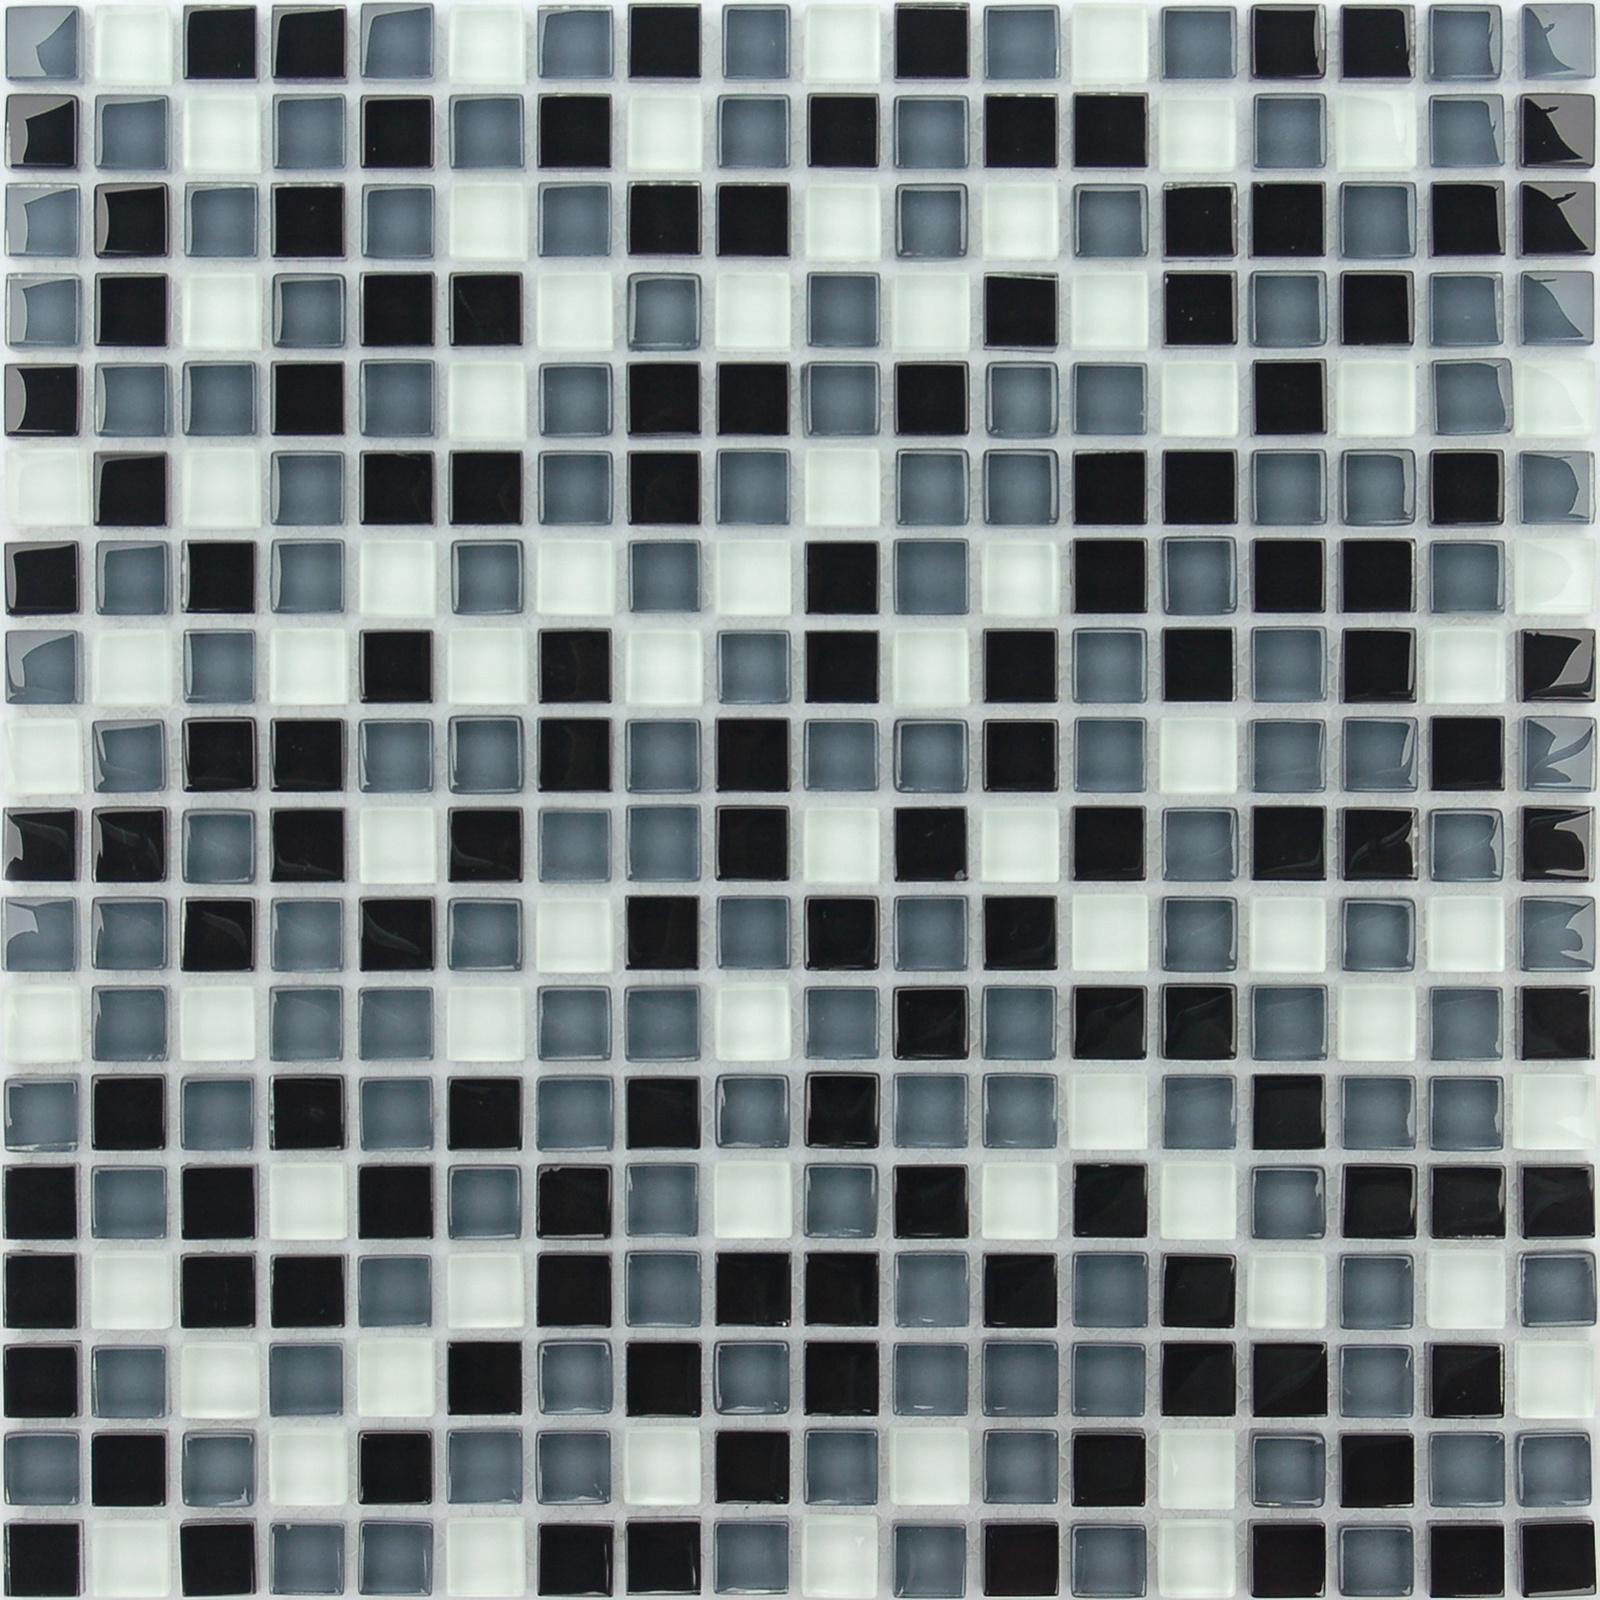 Мозаика из стекла, Baikal 15x15x4, шт.